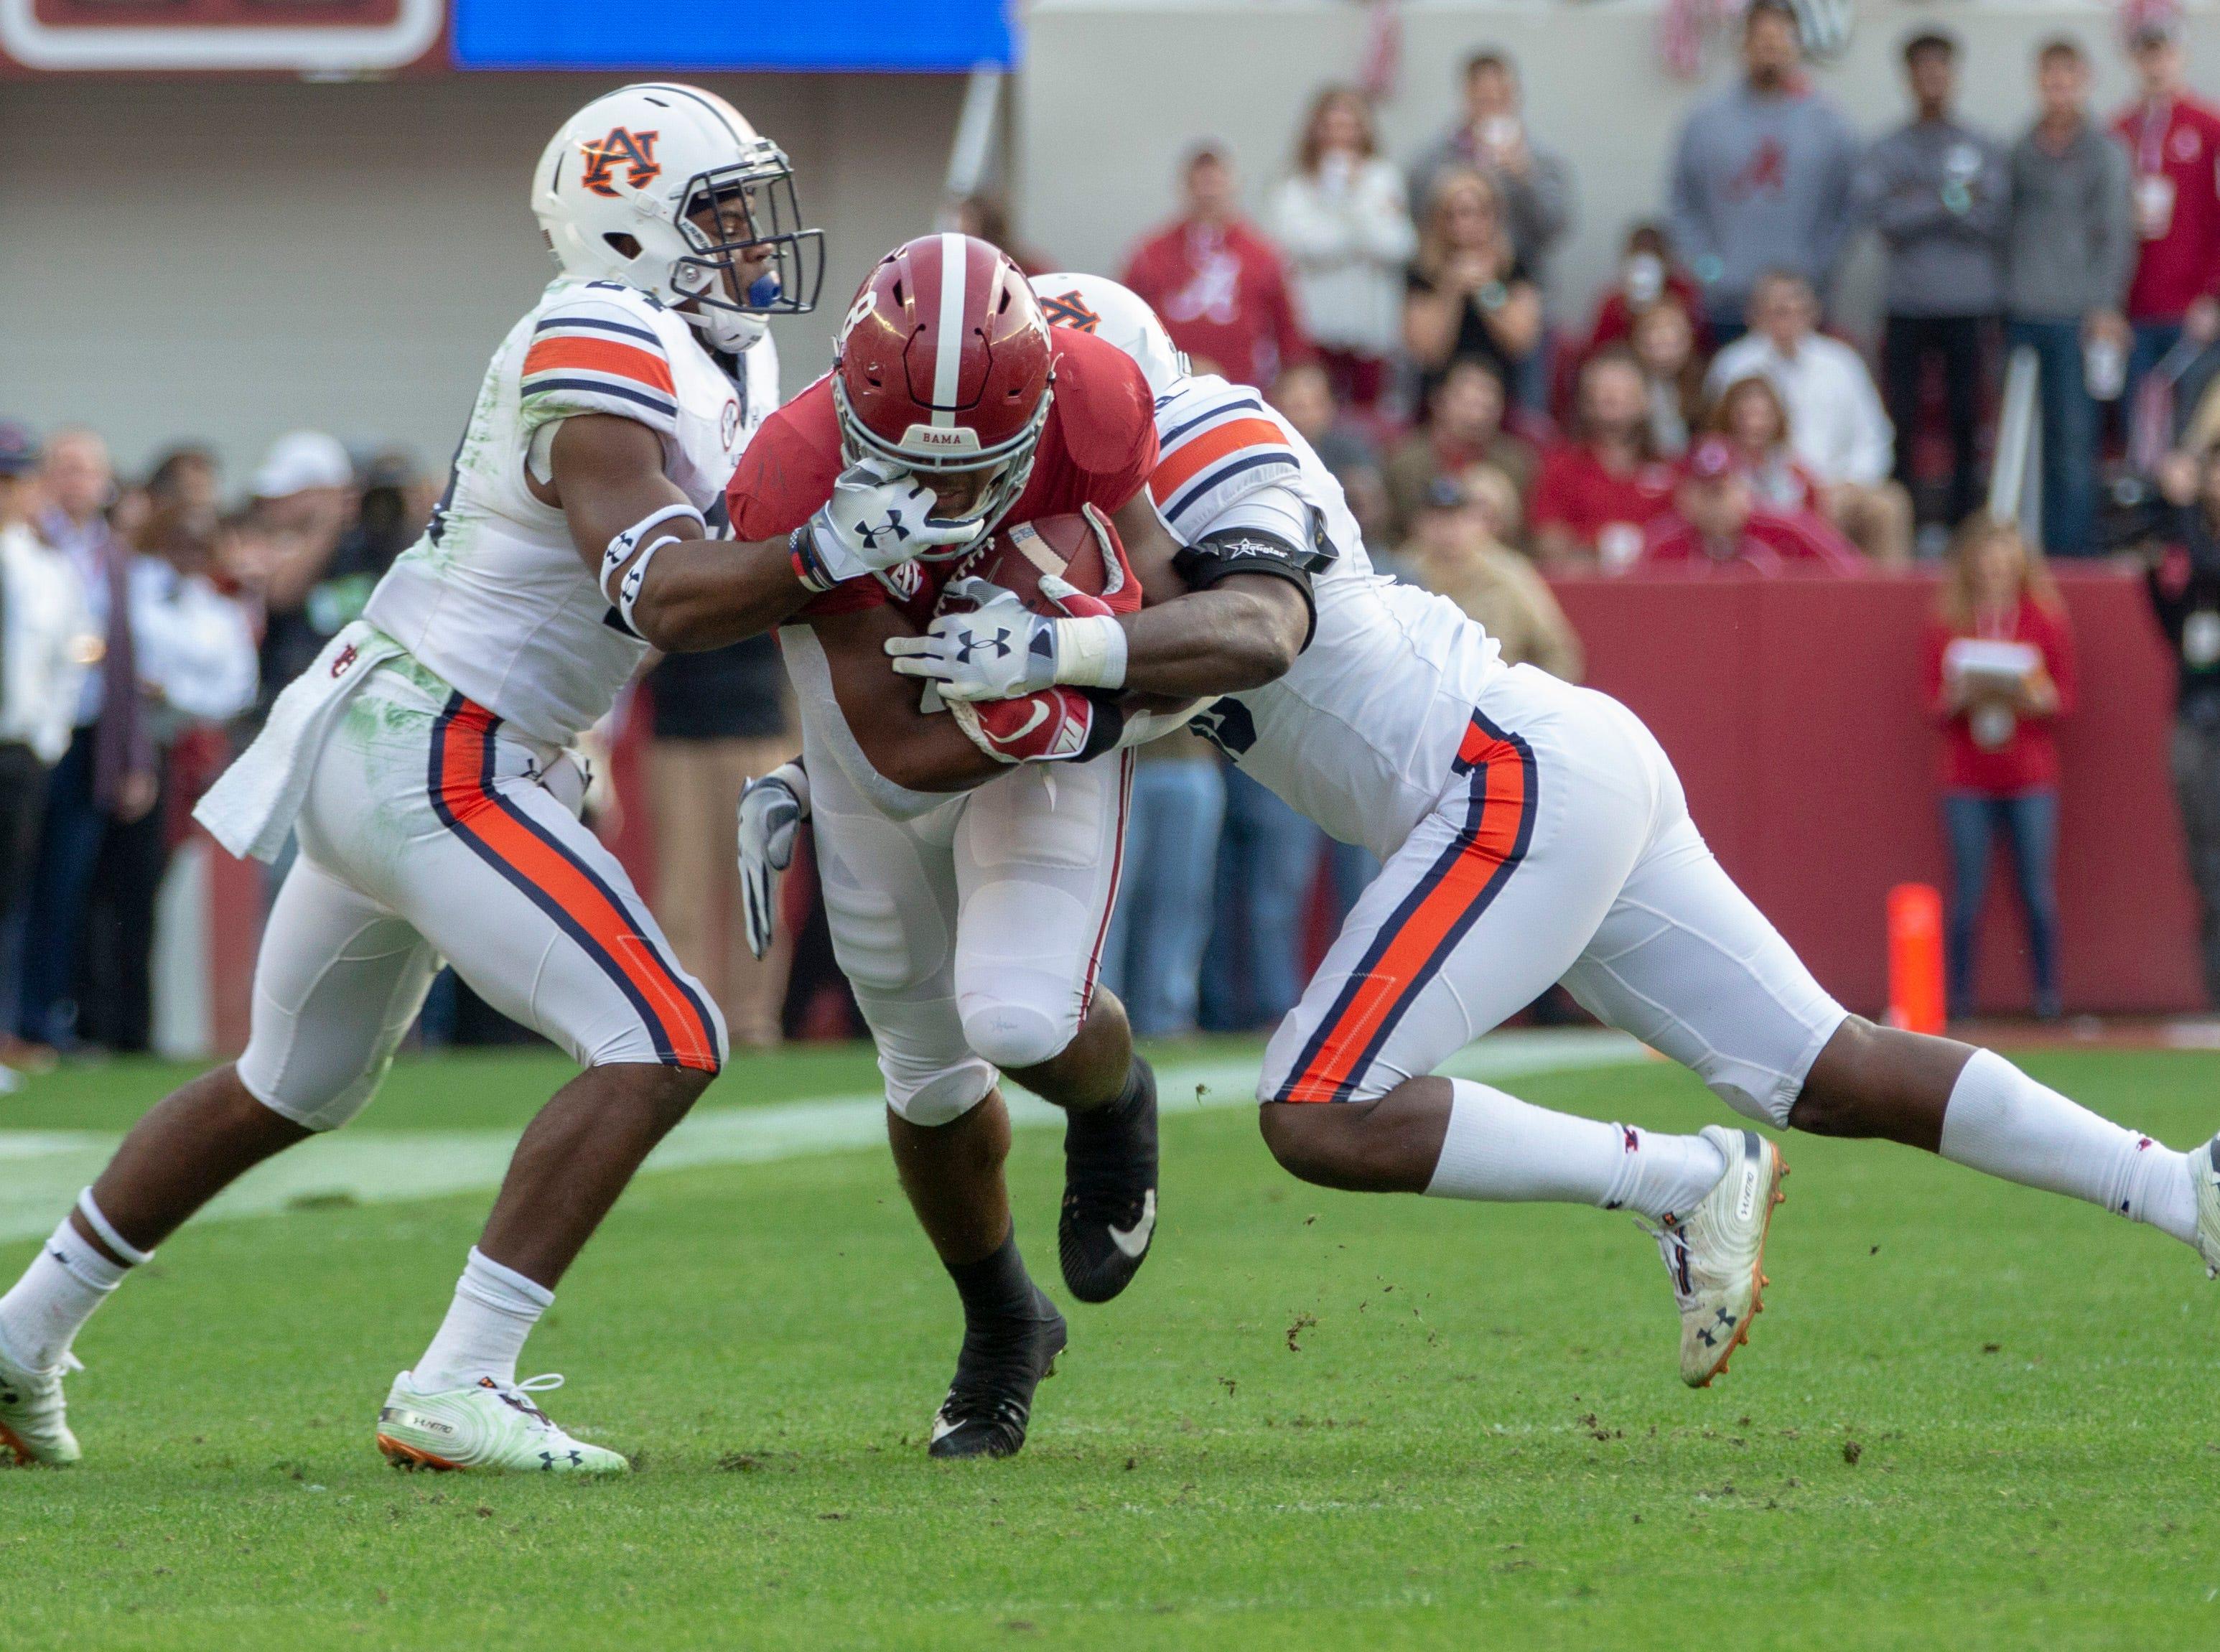 Alabama's Josh Jacobs runs the ball as Auburn's Daniel Thomas grabs his facemark of his helmet.